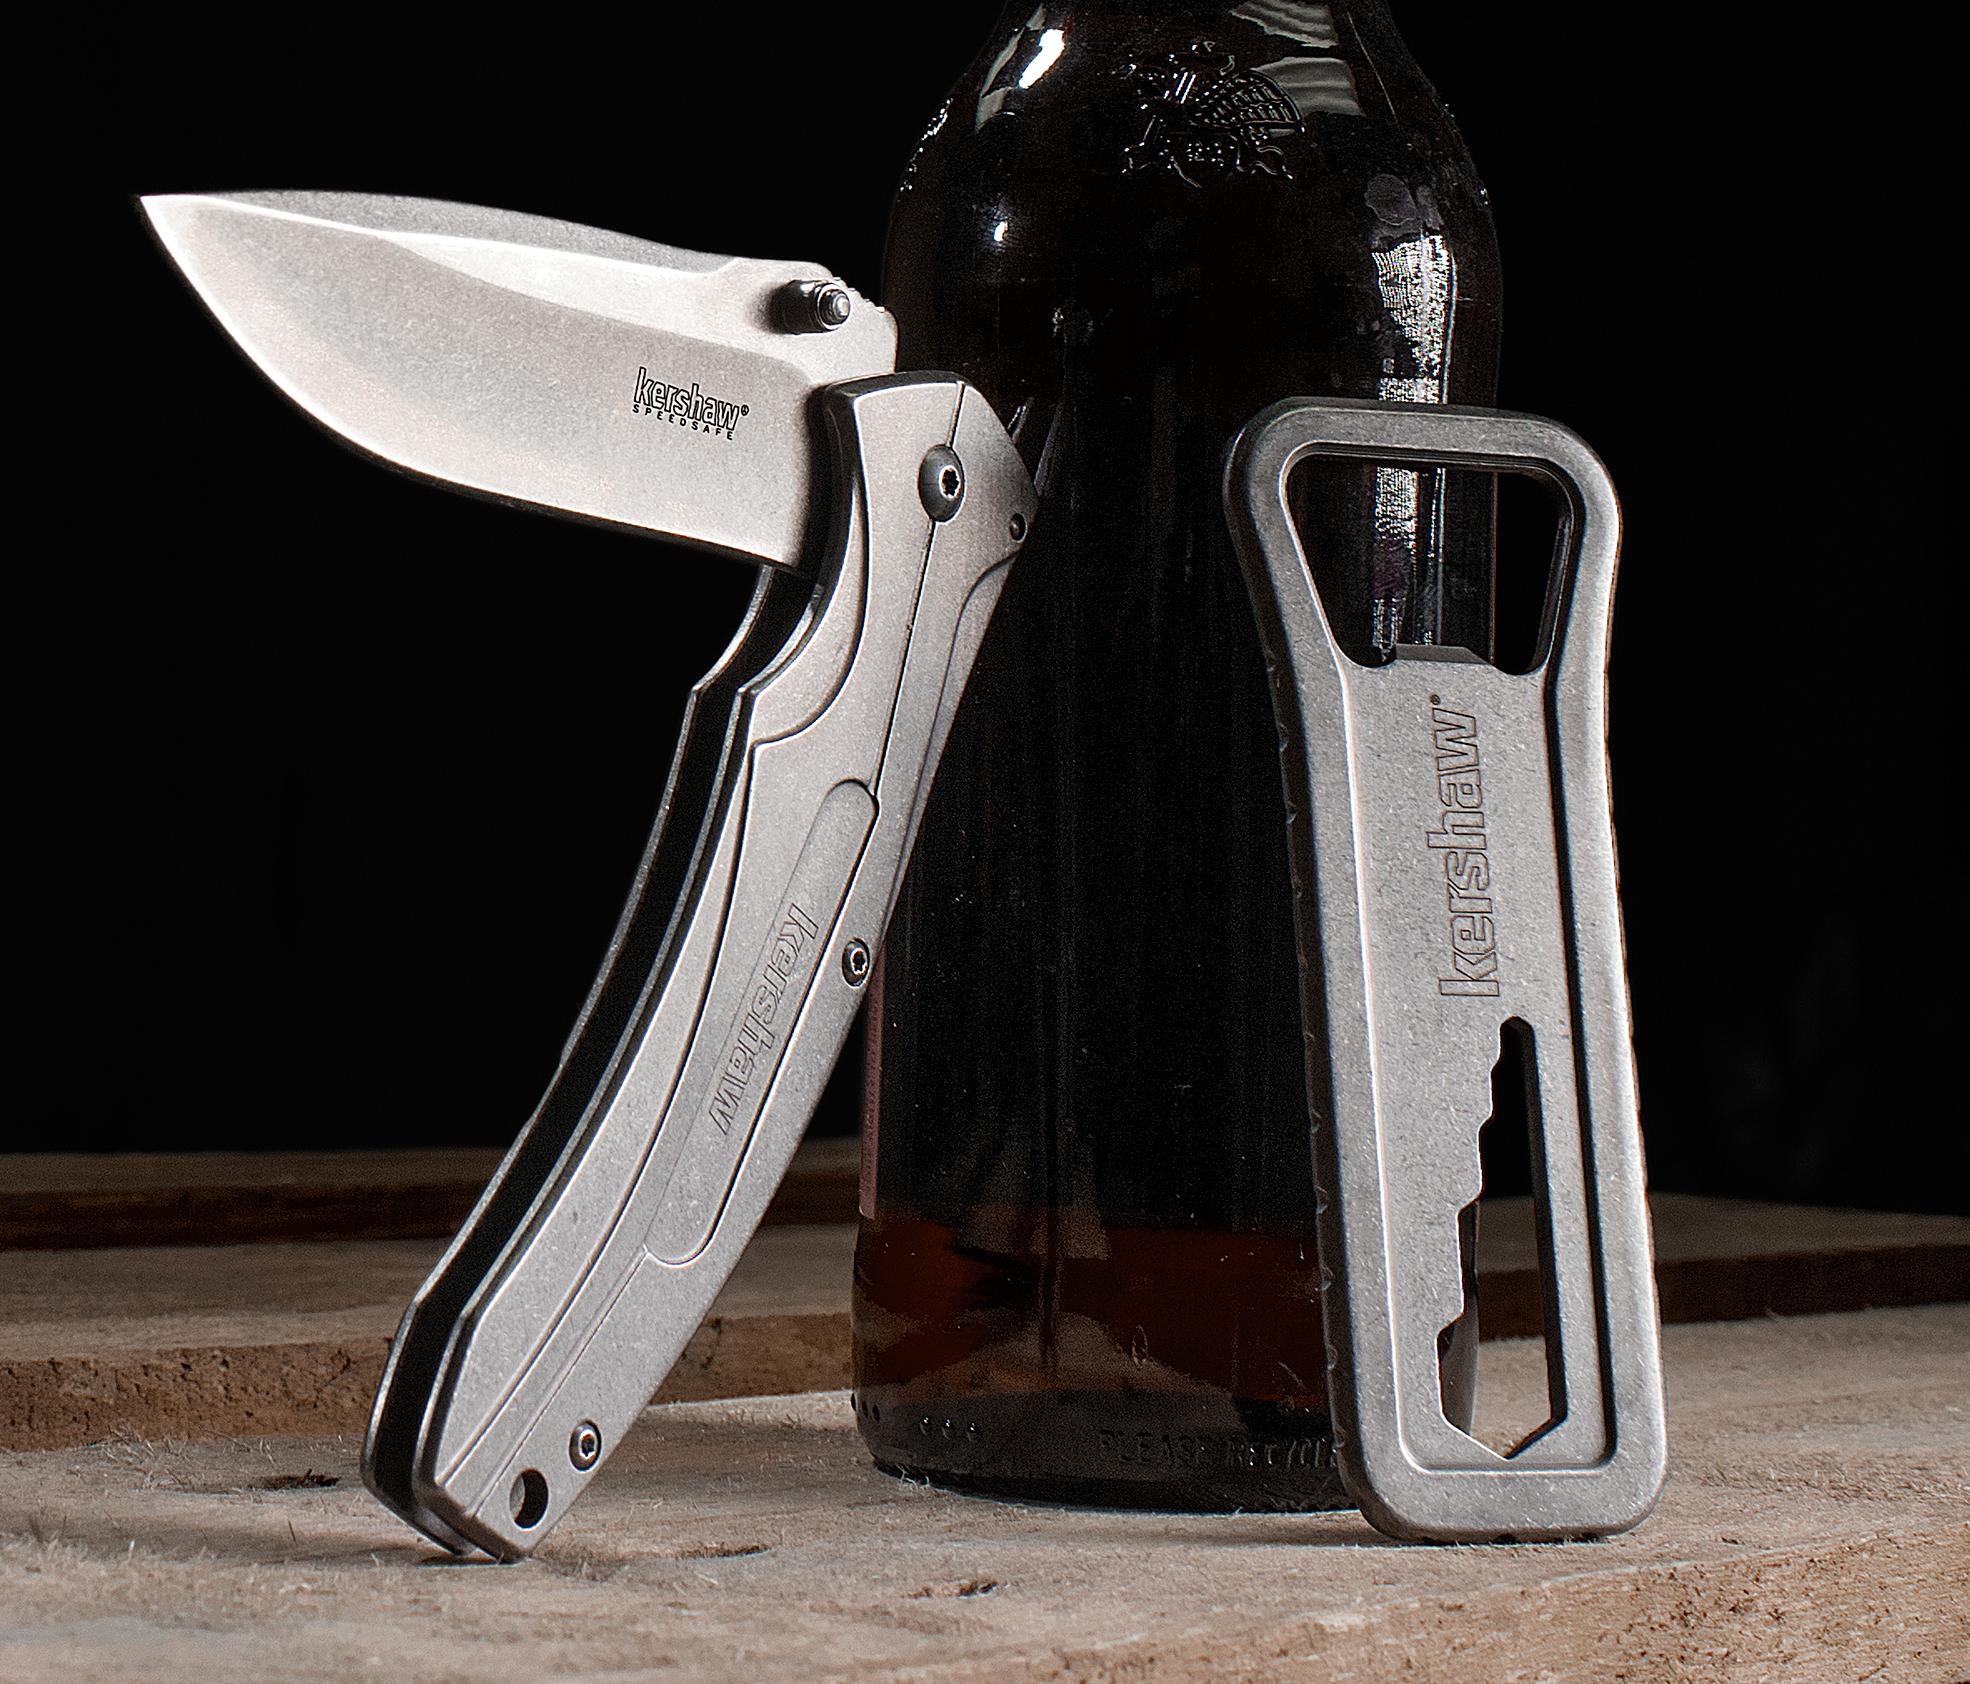 Kershaw 1323KITX KBO Set, Assisted Opening Flipper Knife and Bottle Opener  Multi-Tool